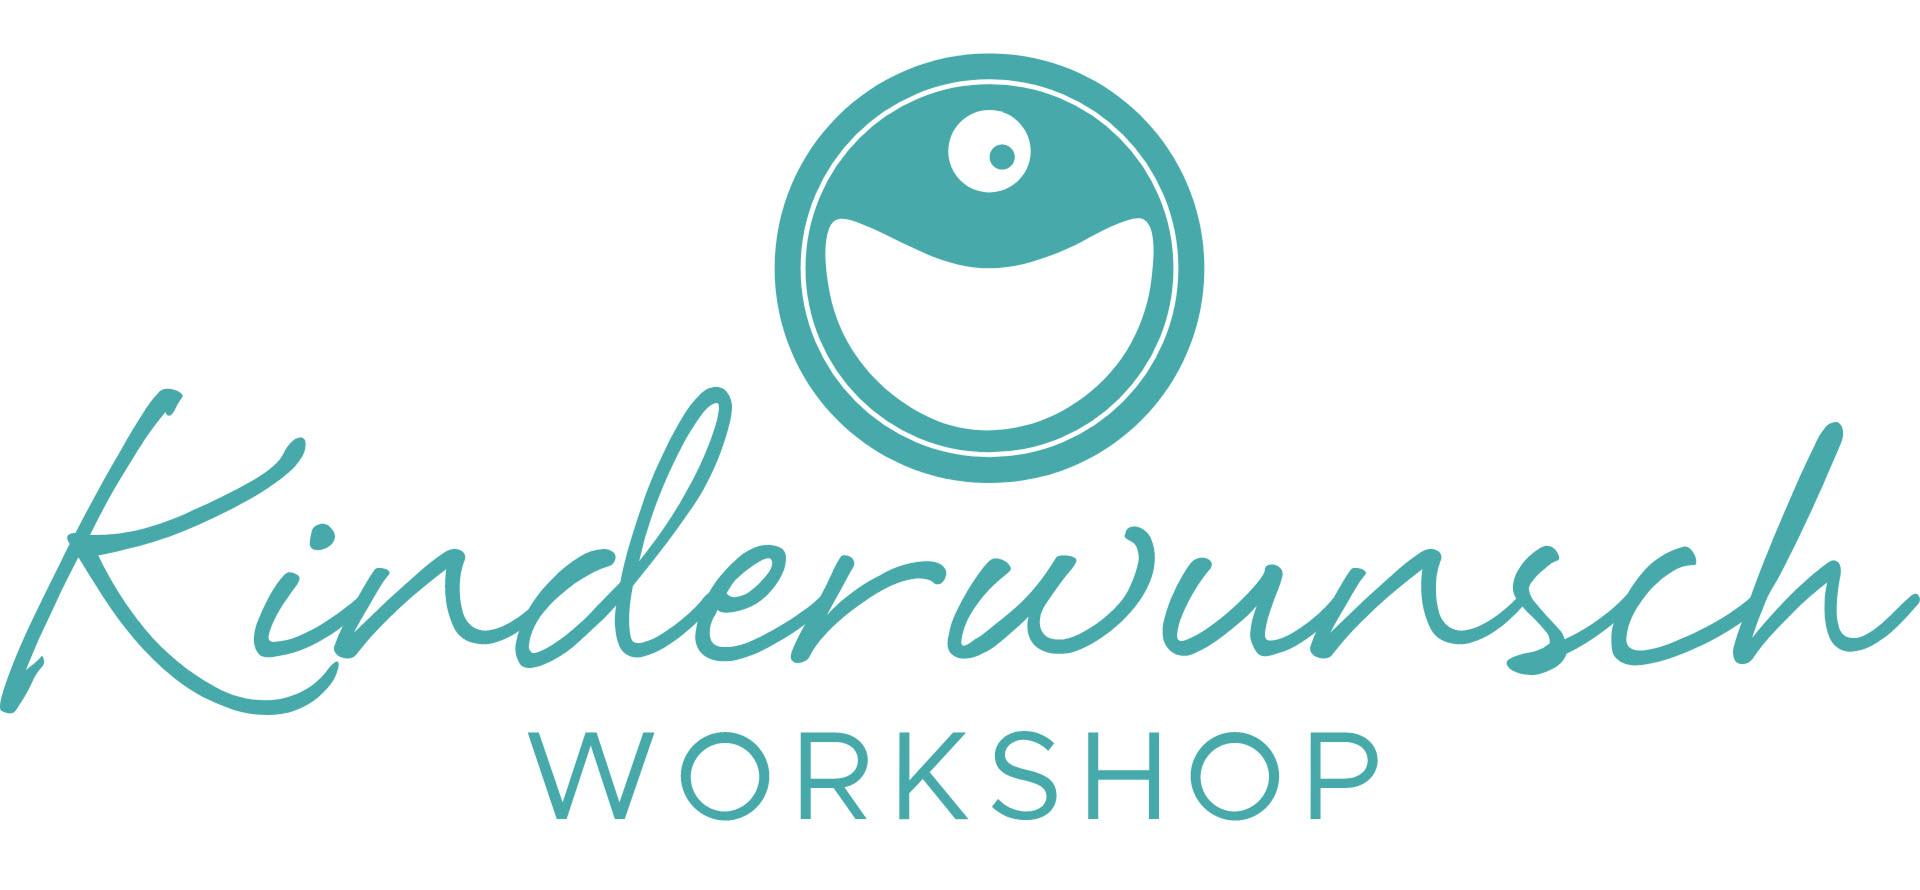 Kinderwunsch-workshop.de